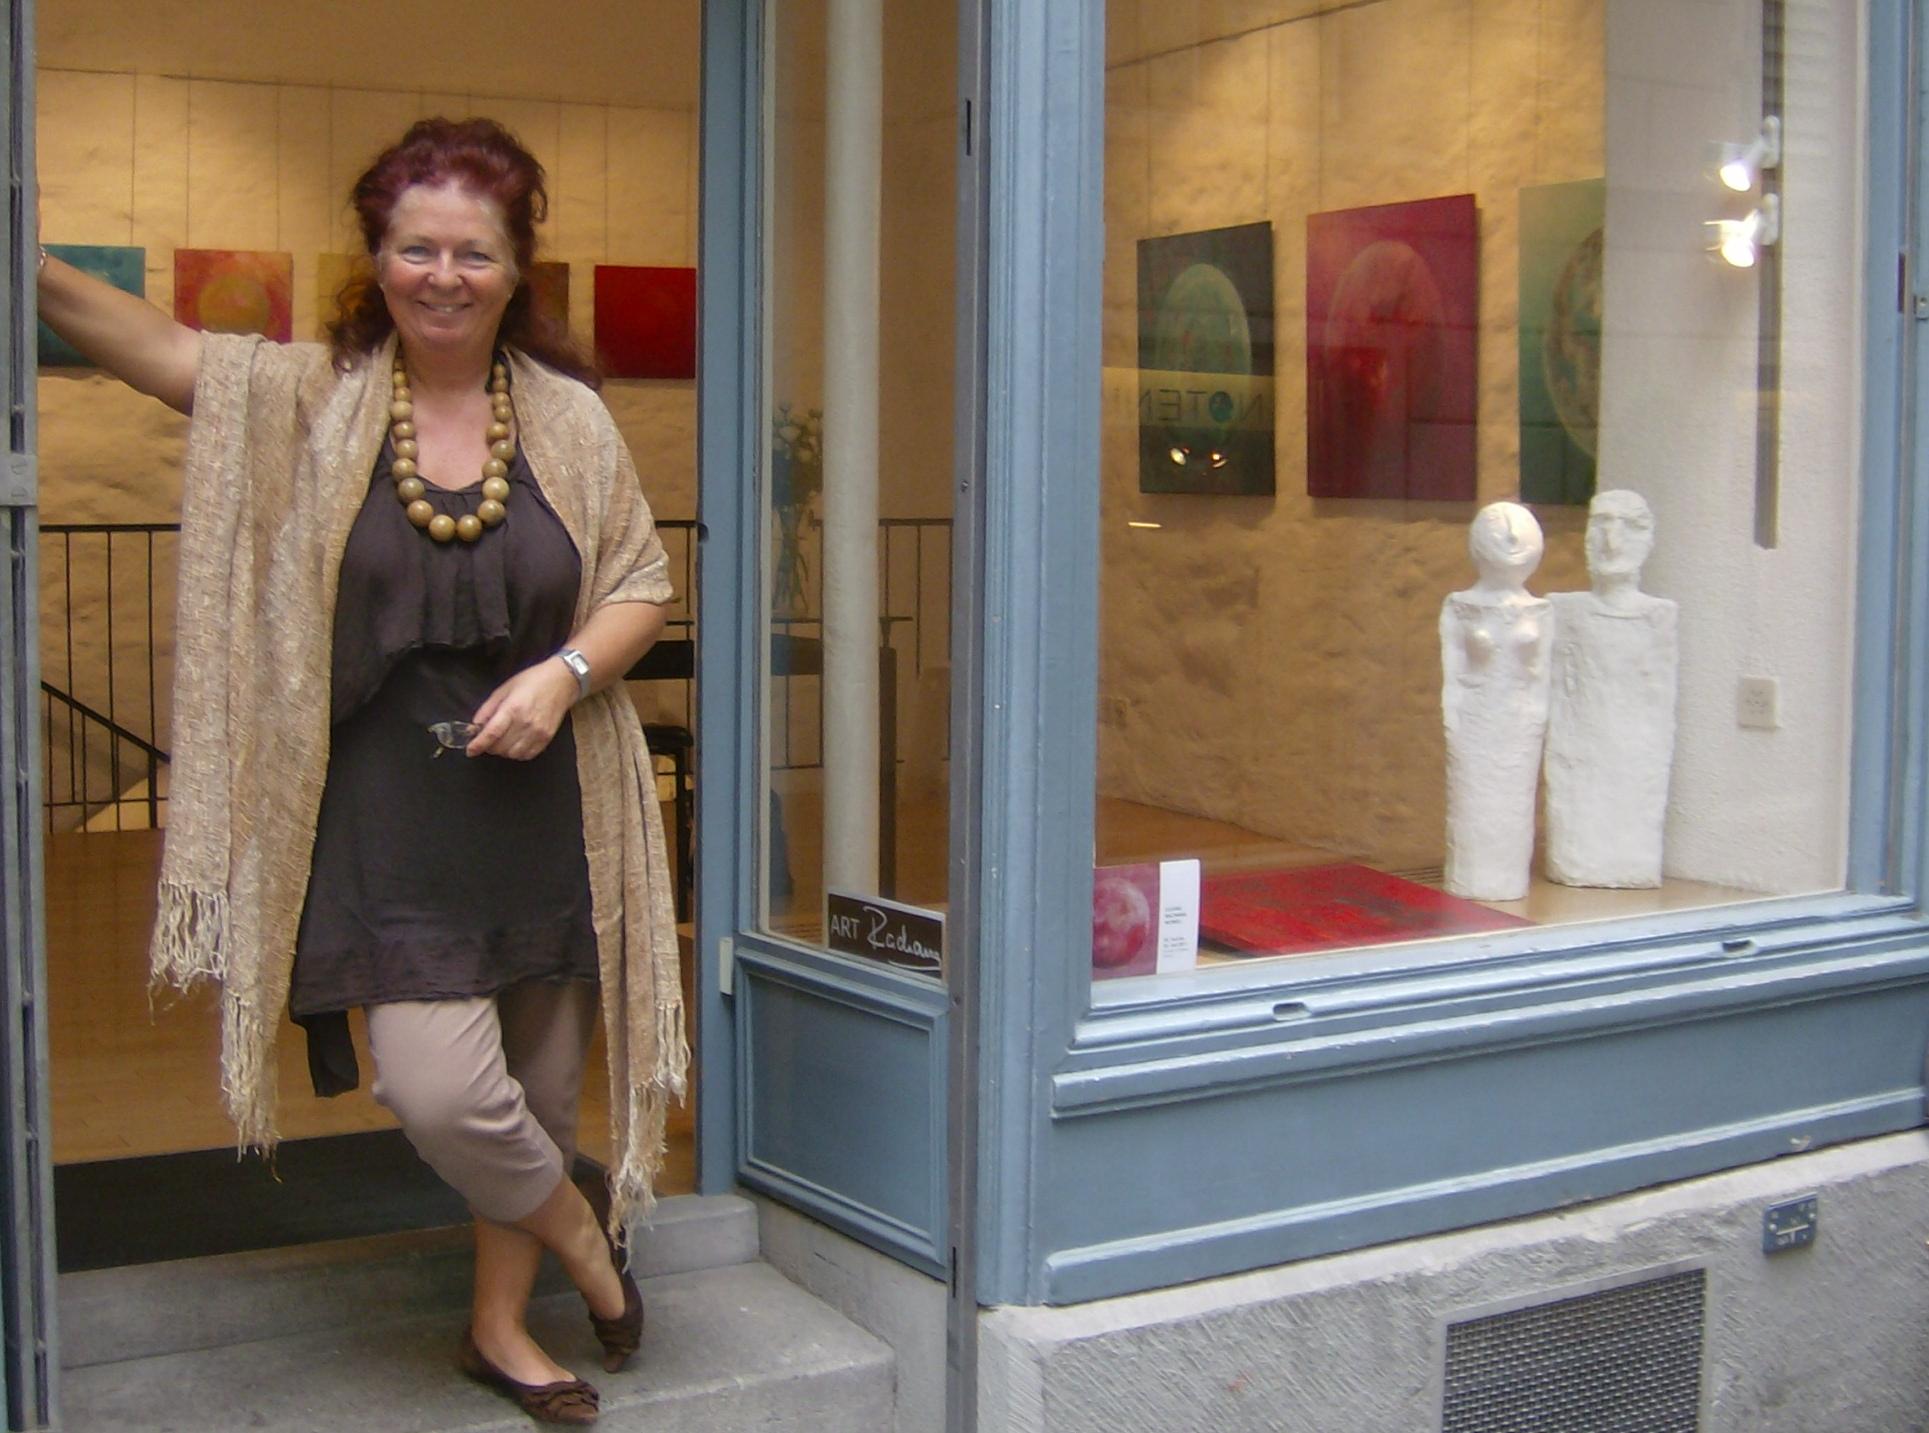 Galerieausstellung Kronengallerie geschn.JPG